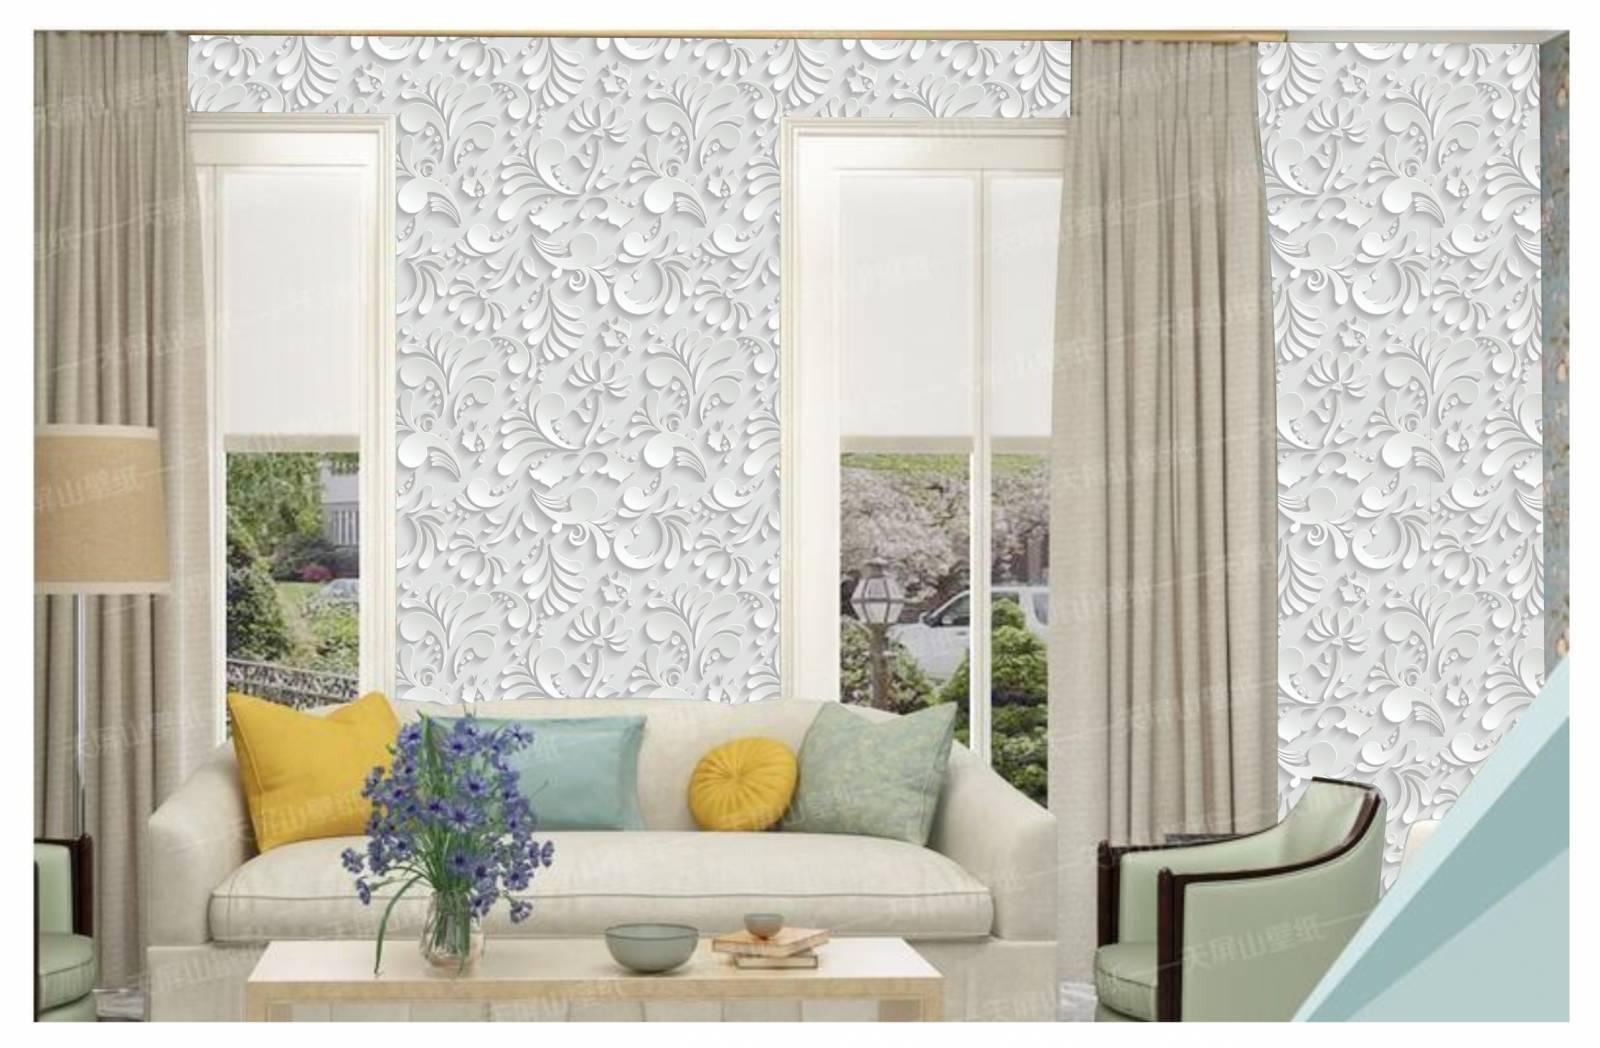 Papel De Parede Adesivo Arabesco Floral Branco 300x52cm - LCGELETRO